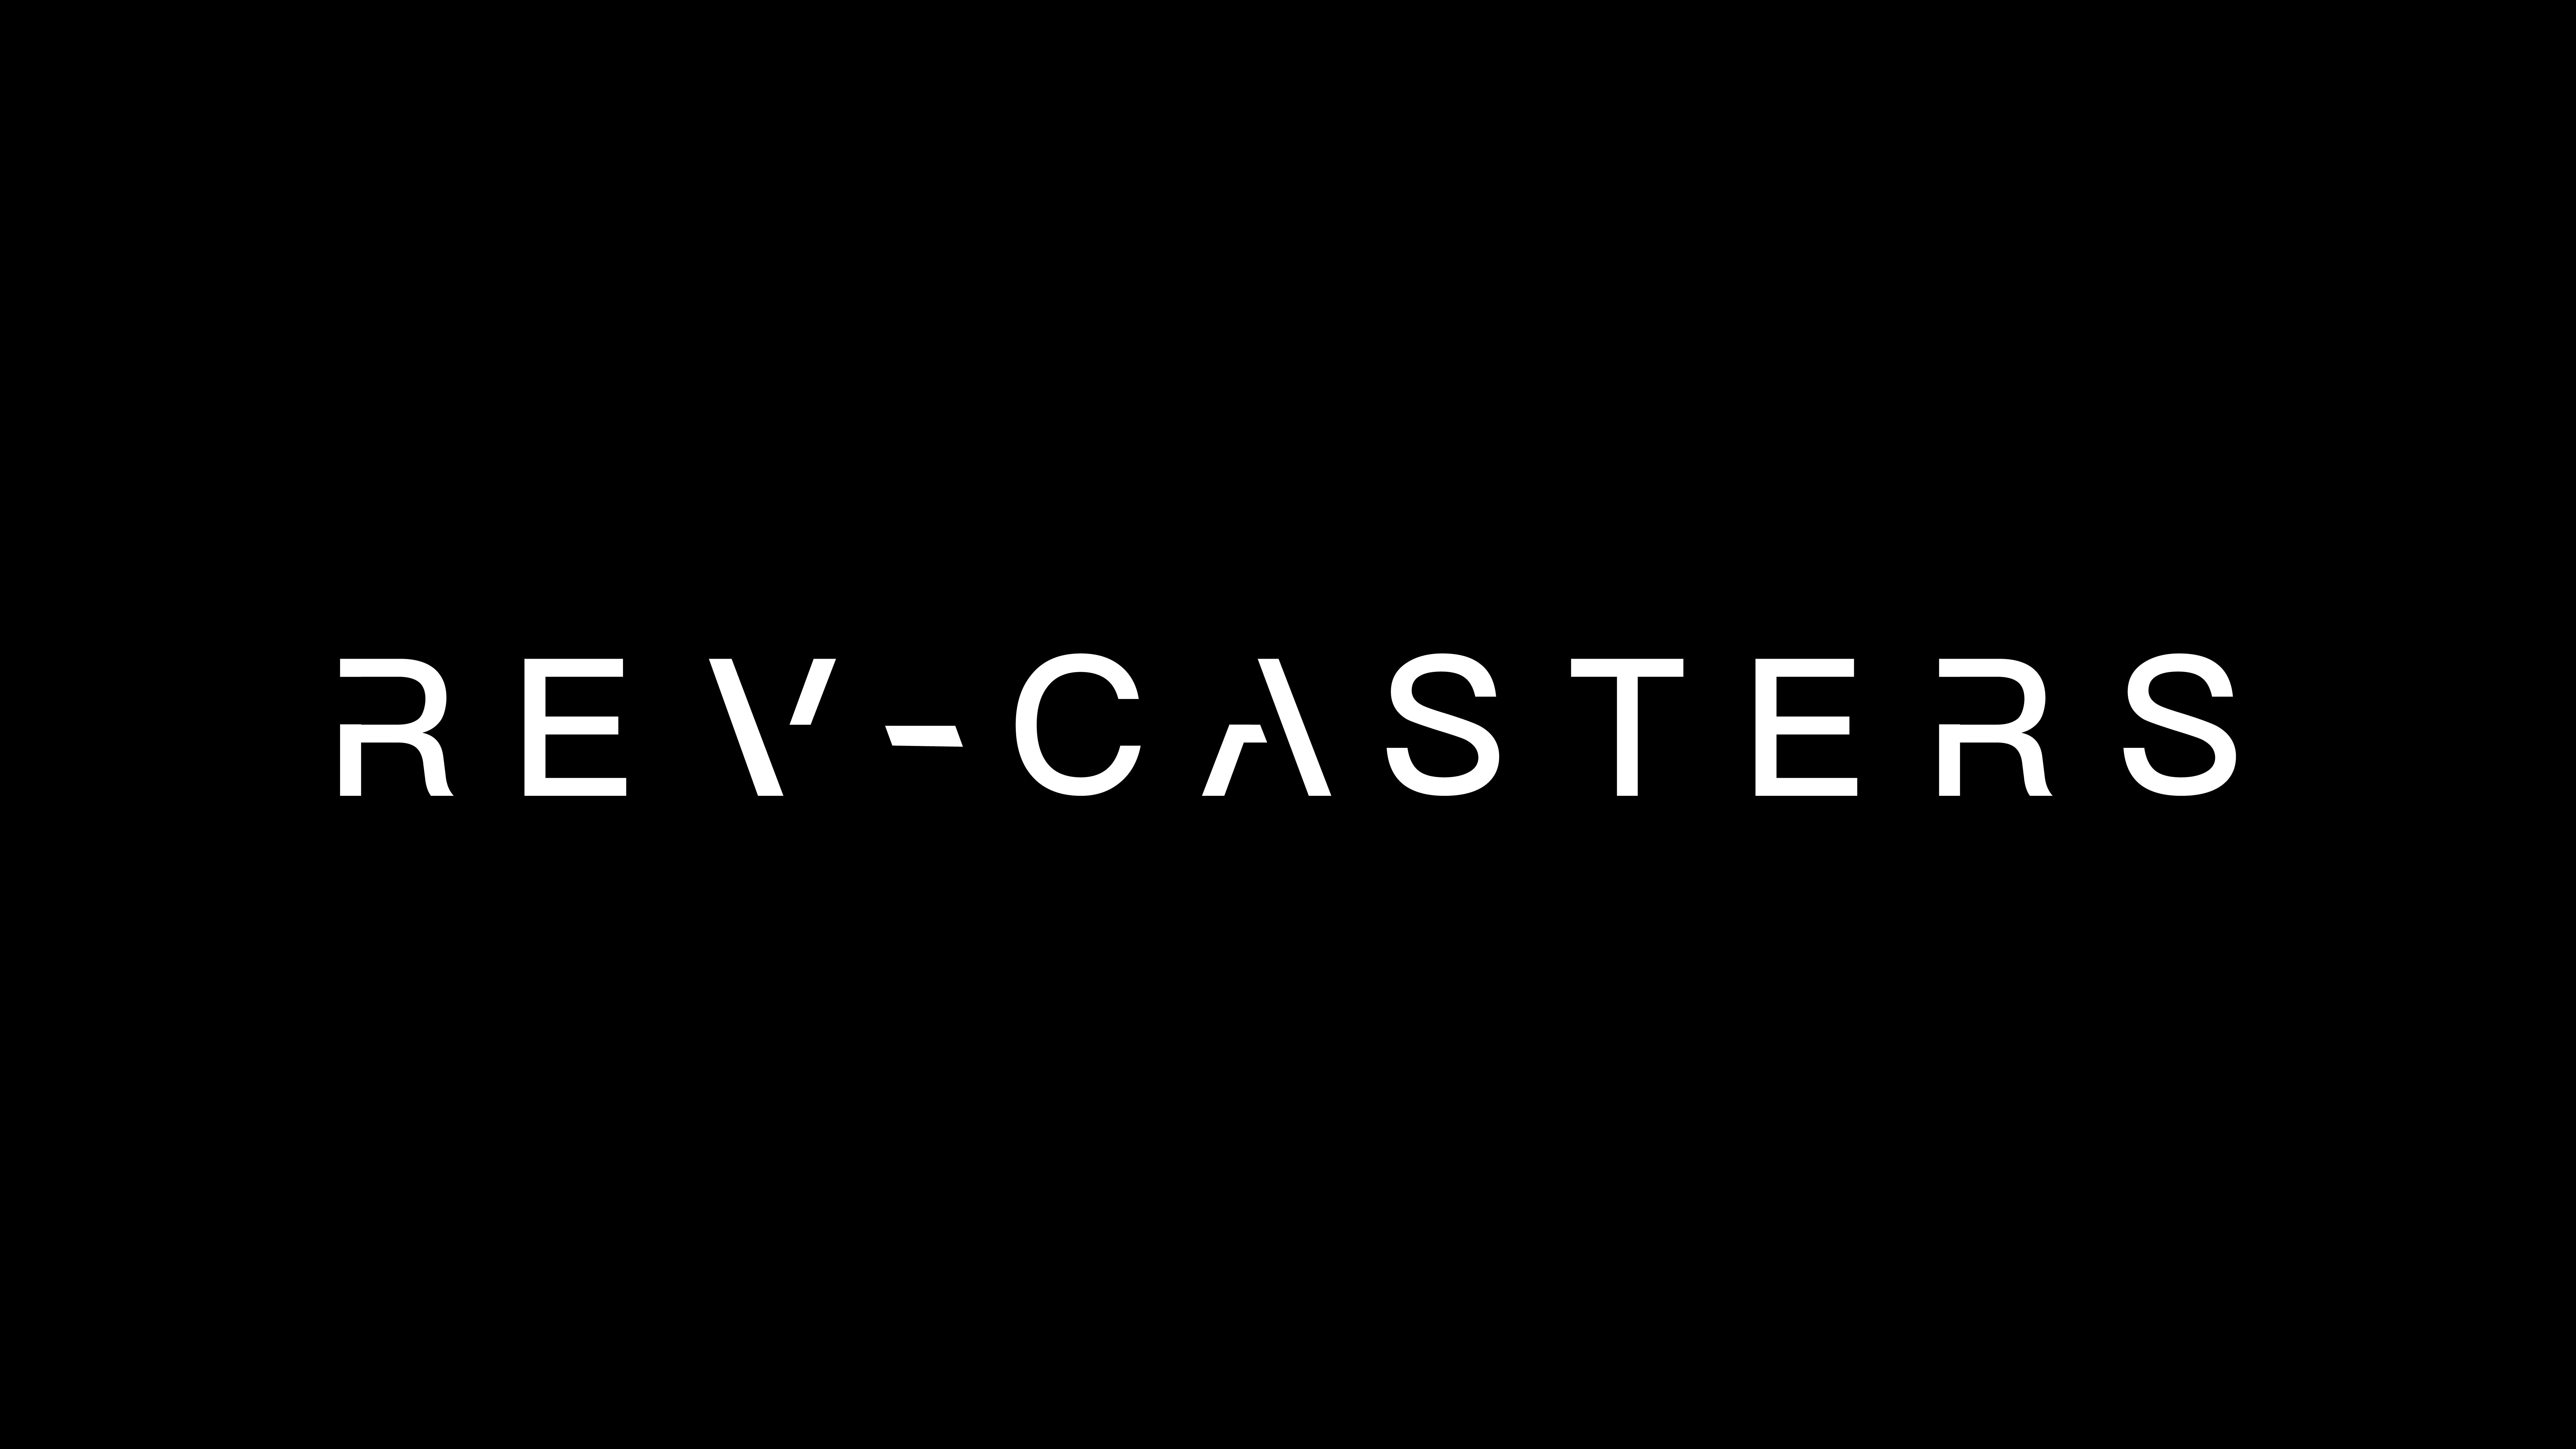 Rev-casters Black